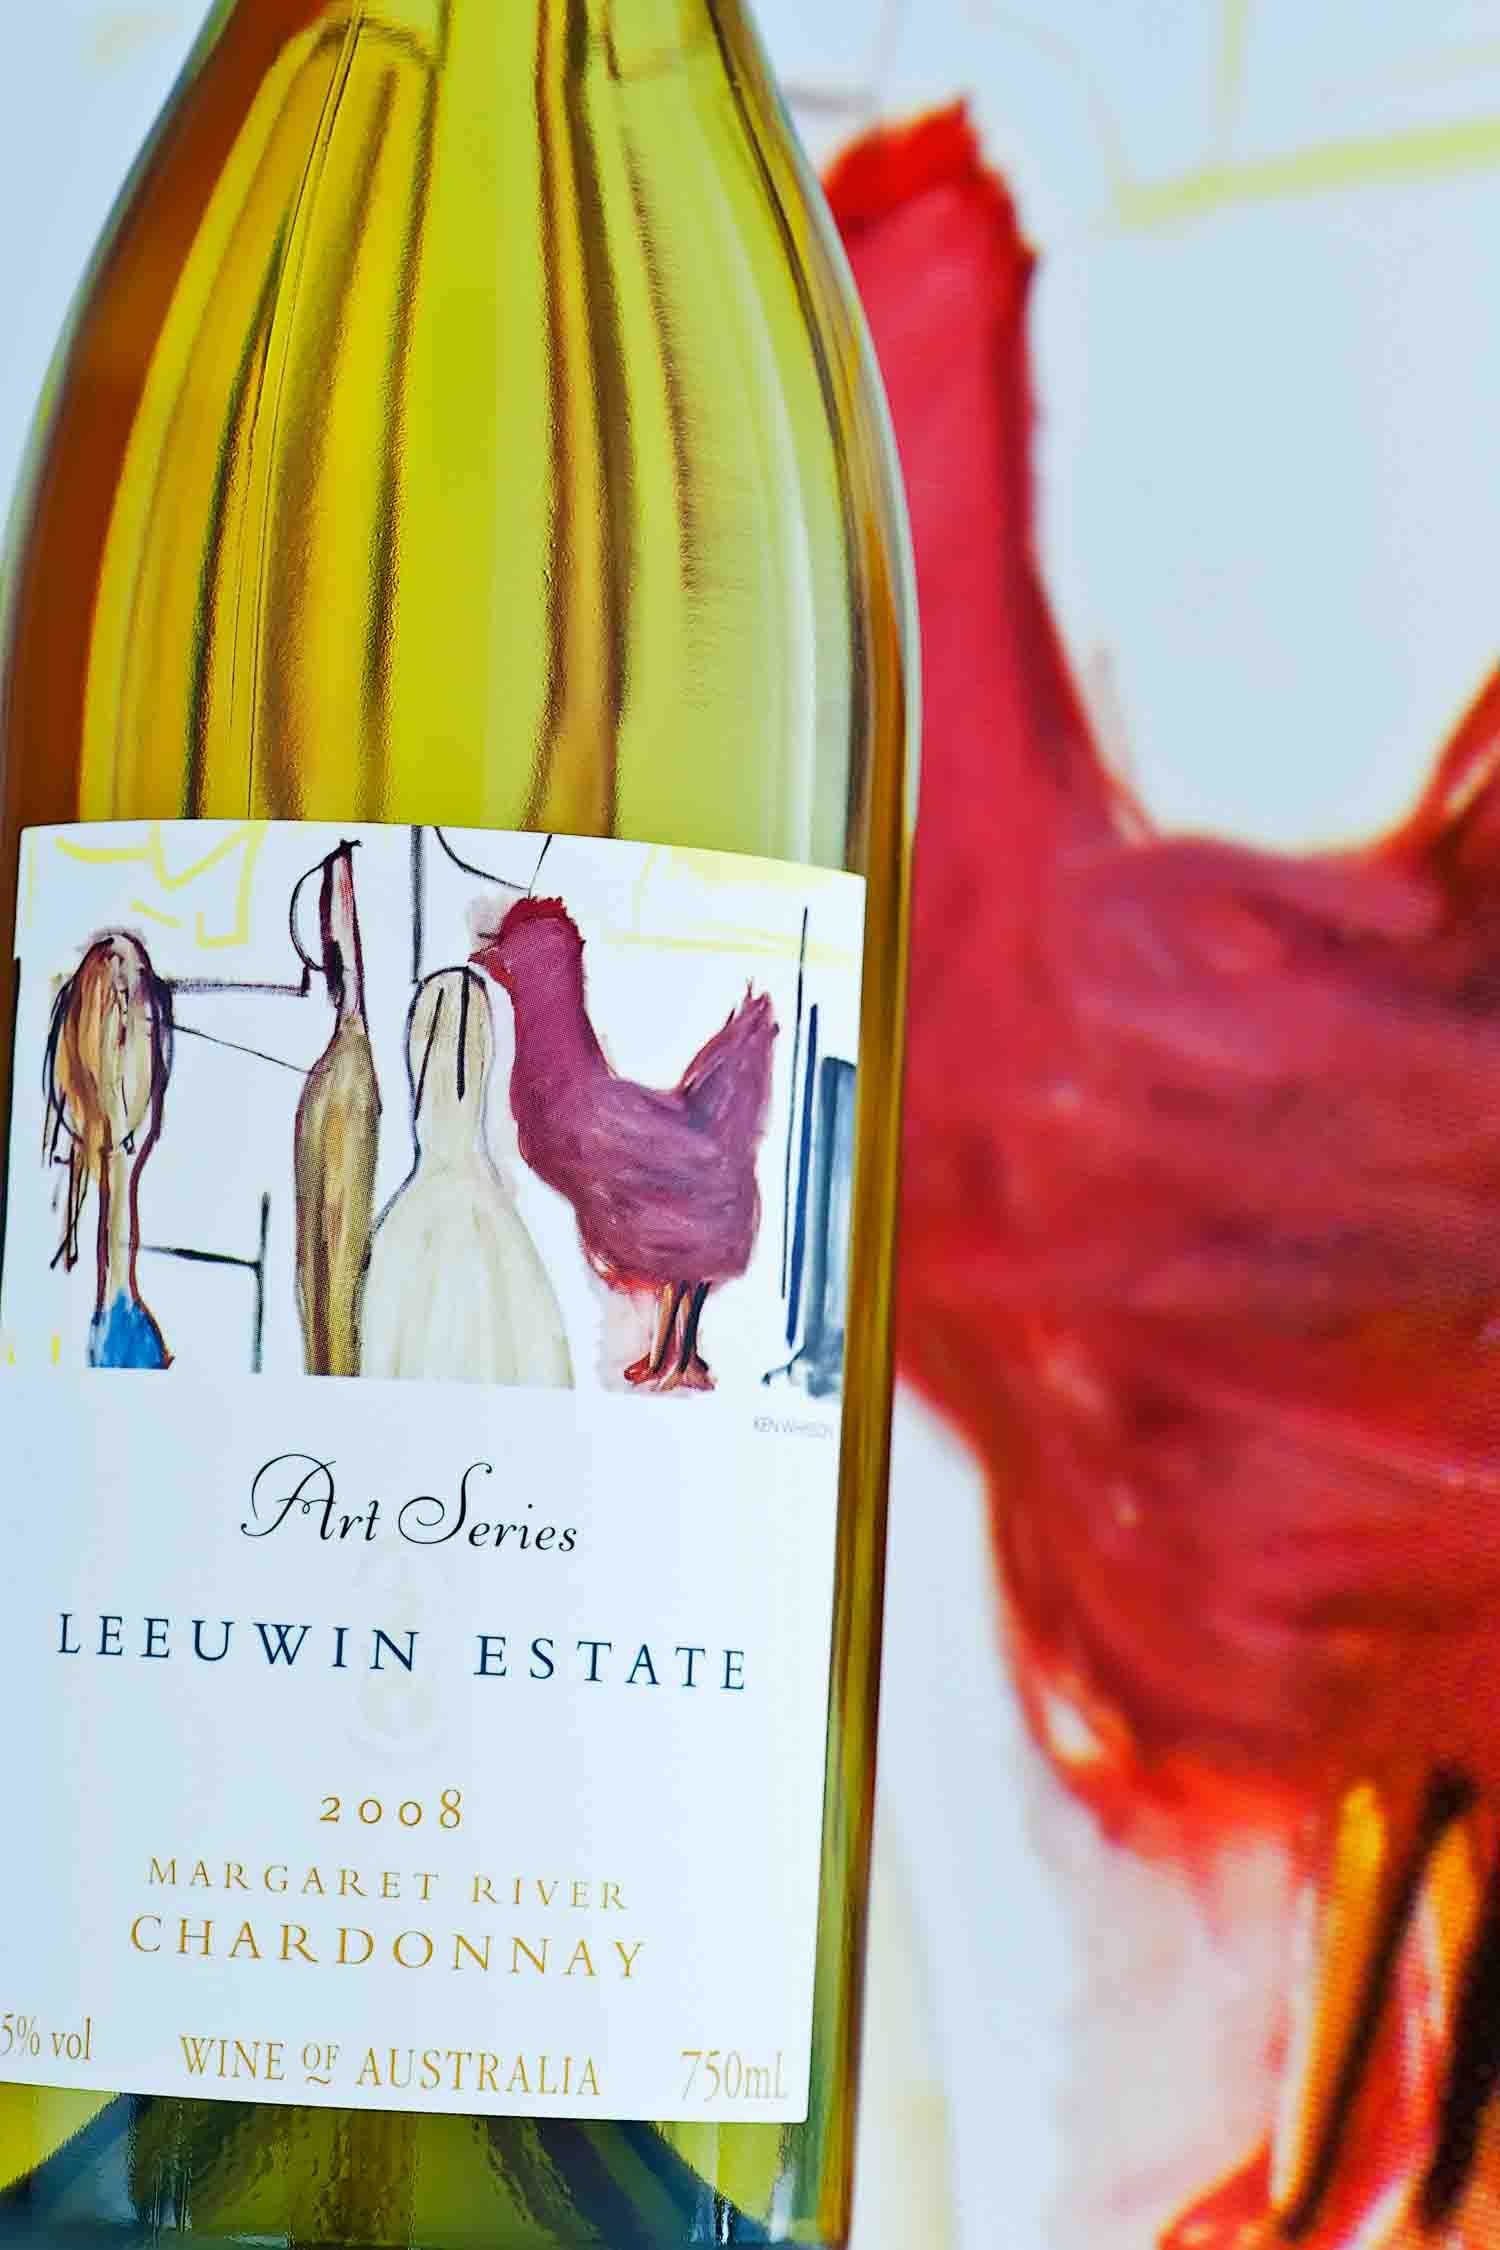 Leeuwin Estate Art Series Chardonnay 2008 Margaret River Australia Wine List Wine And Spirits Wine Bottle